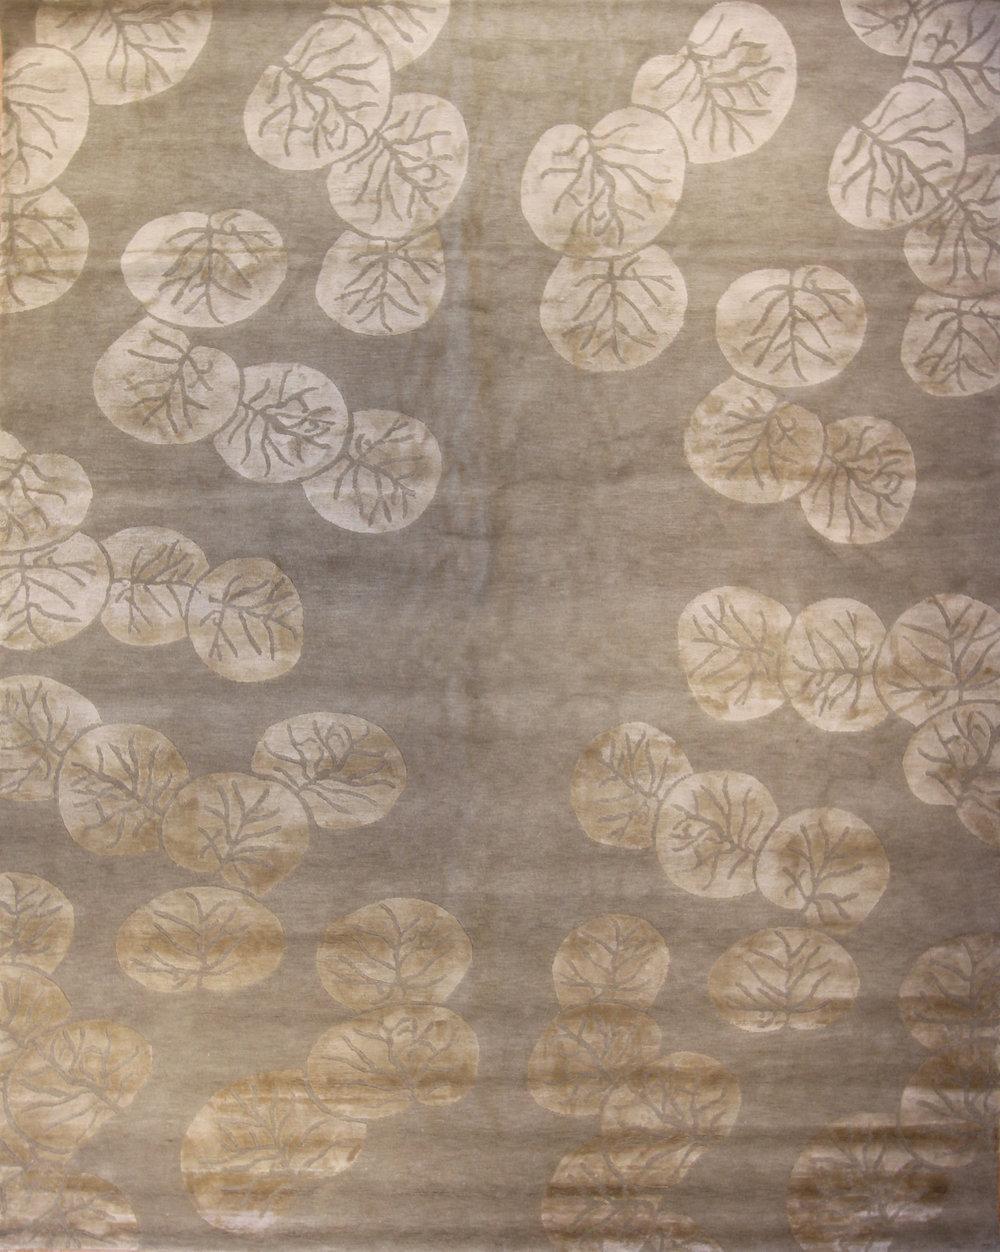 775 Seagrape, Nepal, Wool and Silk, 8'x10'